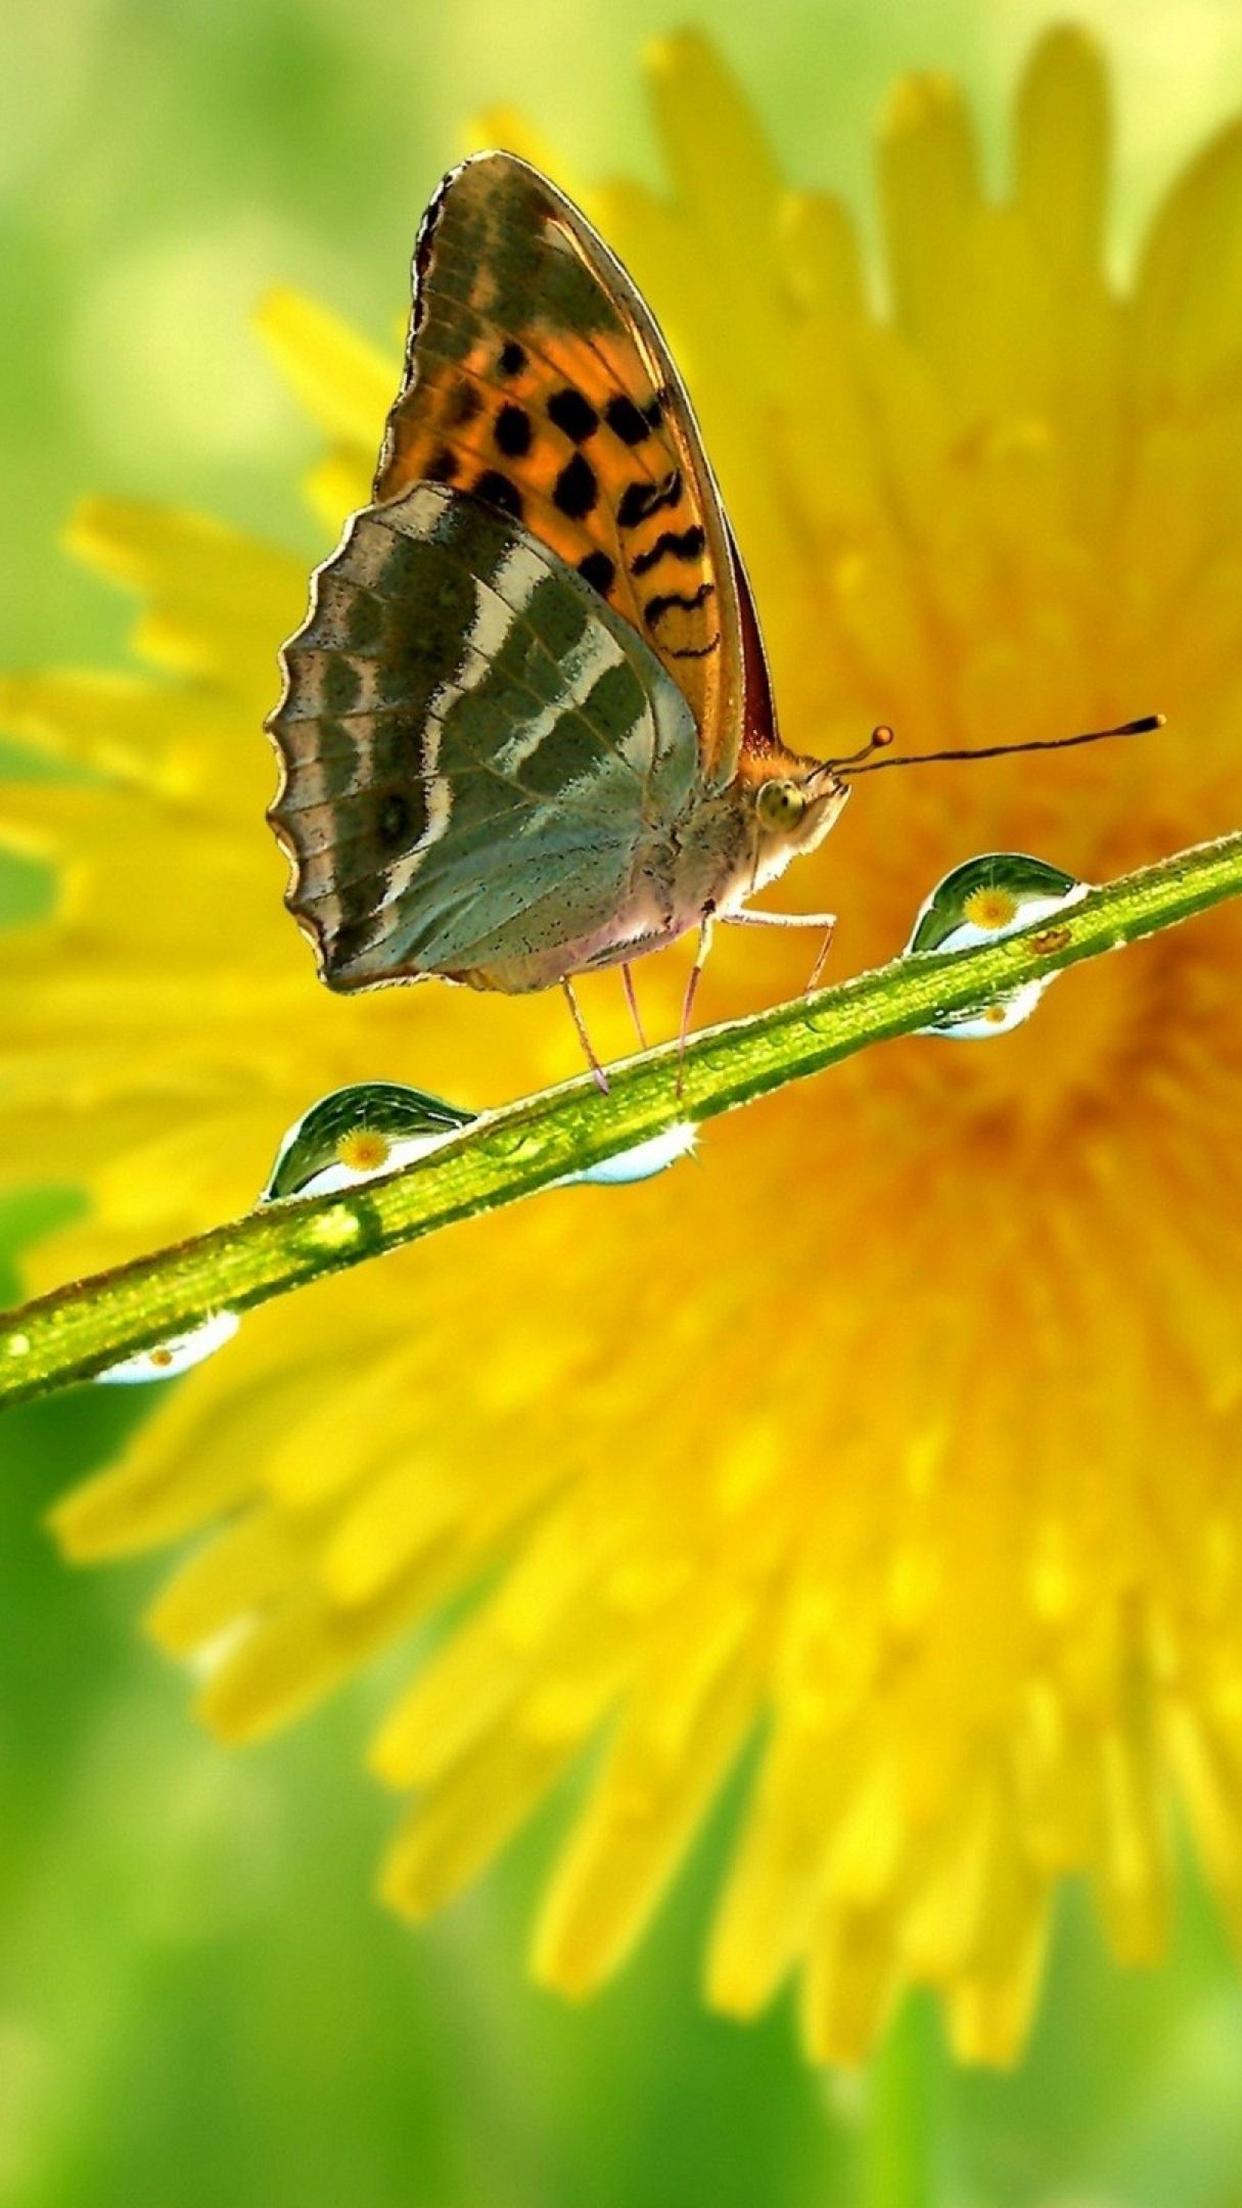 Butterfly Flower 3Wallpapers iPhone Parallax Butterfly Flower